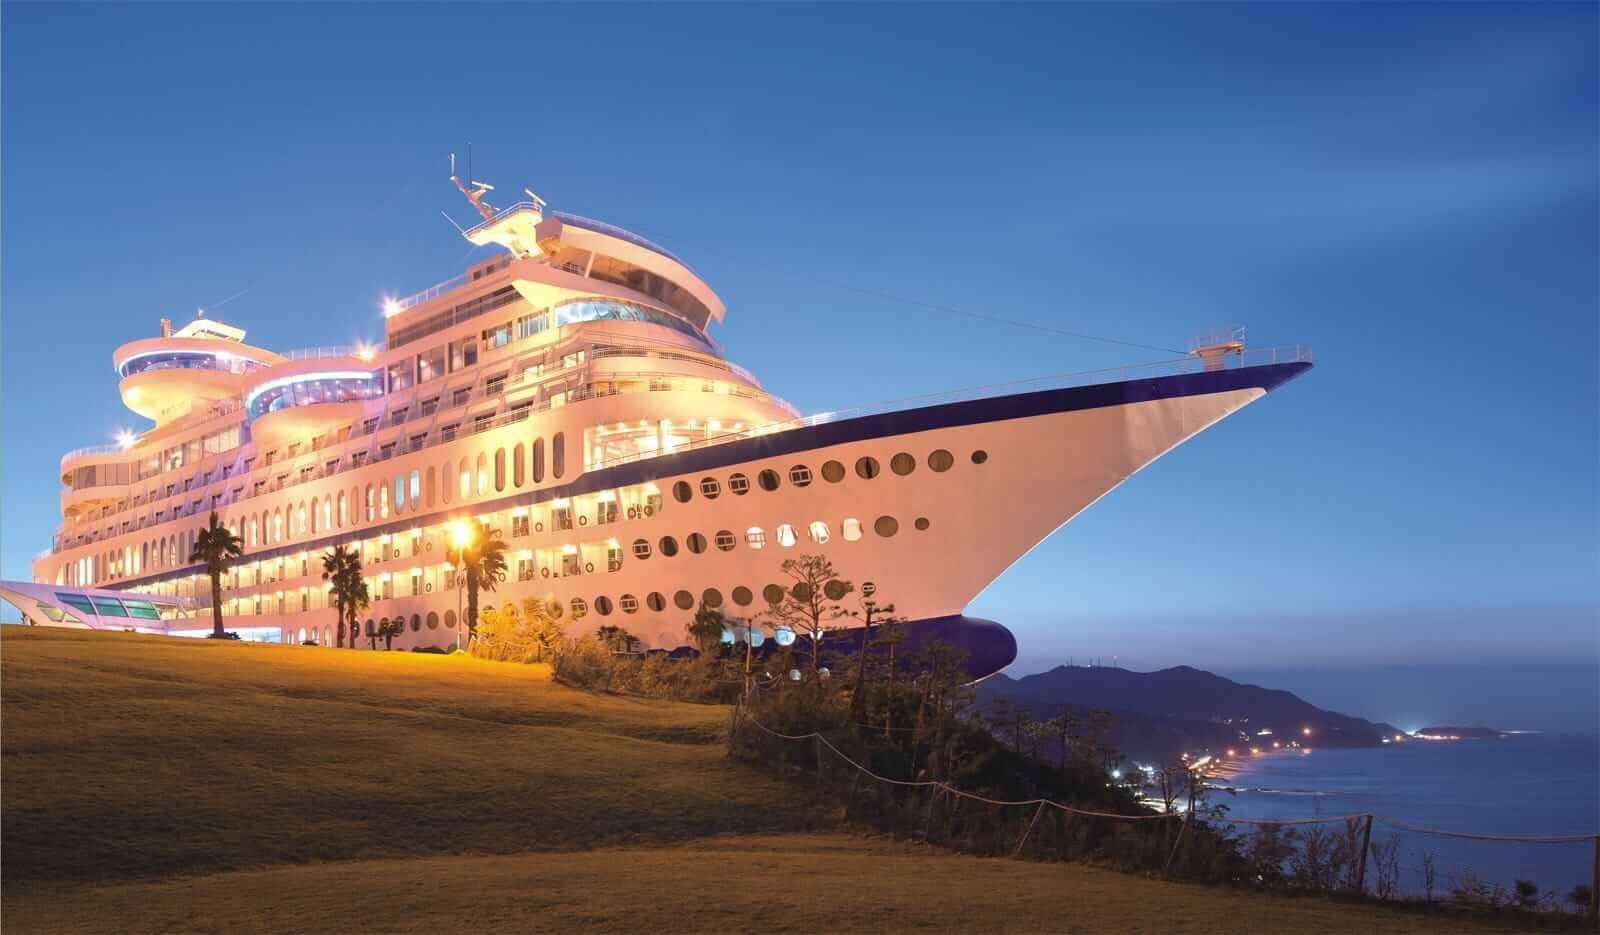 Sun cruise resort, Korea Hoteles únicos